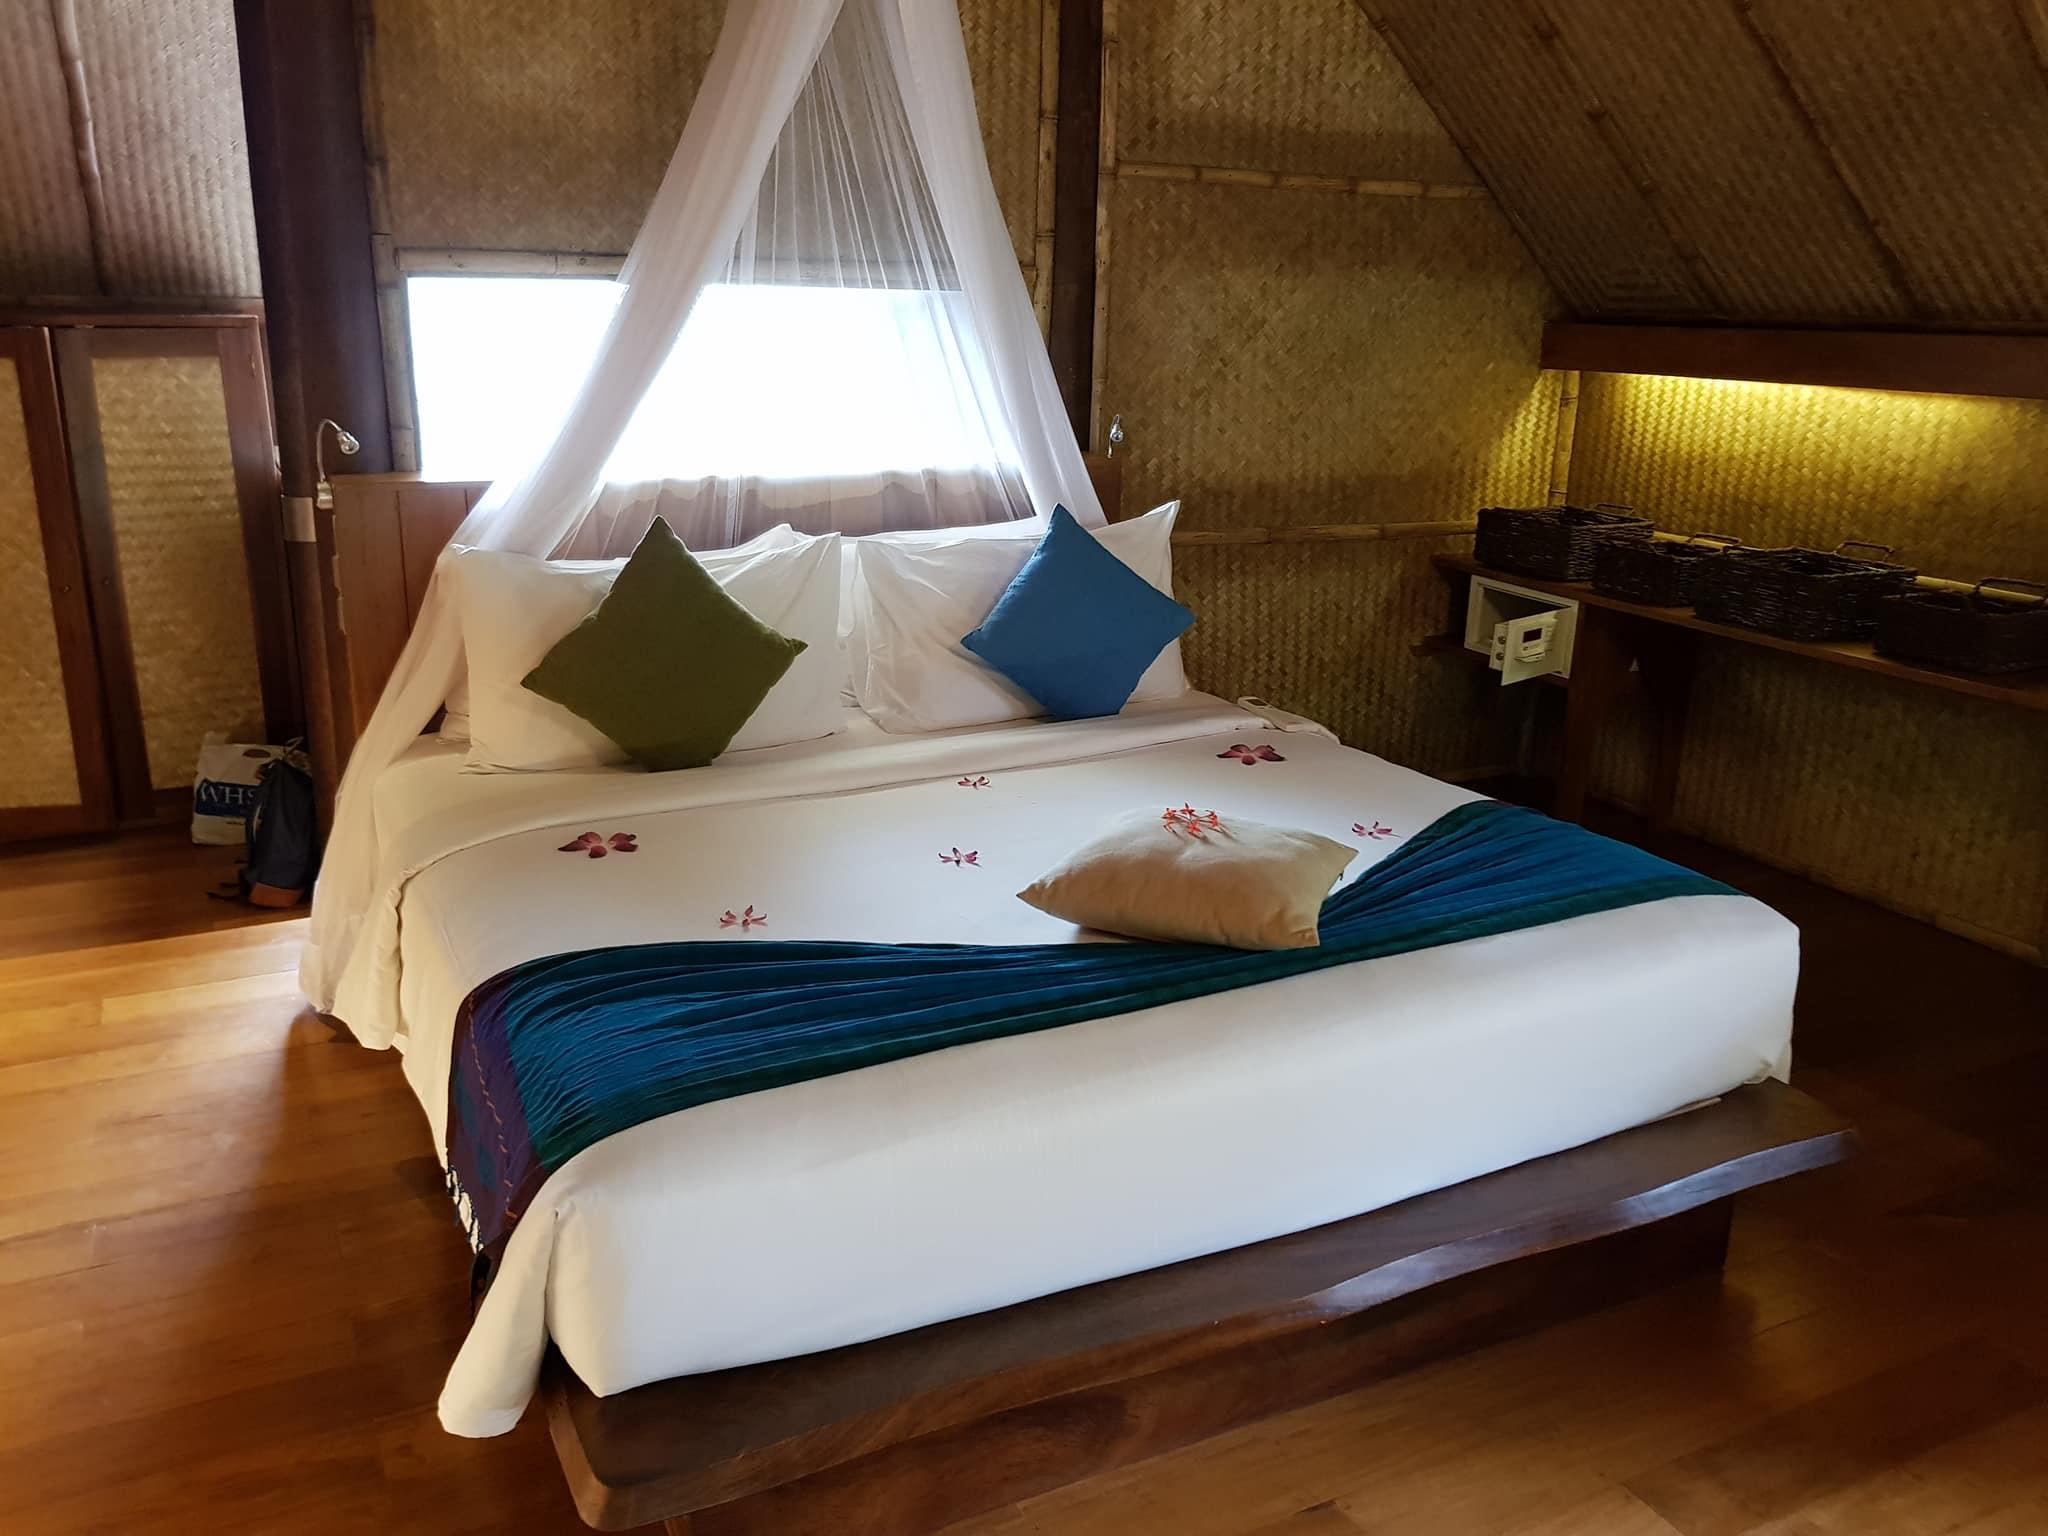 invite-to-paradise-sri-lanka-maldives-holiday-honeymoon-specialists-customer-guest-feedback-zane-lisa-butcher-jetwing-vil-uyana-hotel-sigiriya-cultural-triangle-room-bed.jpg